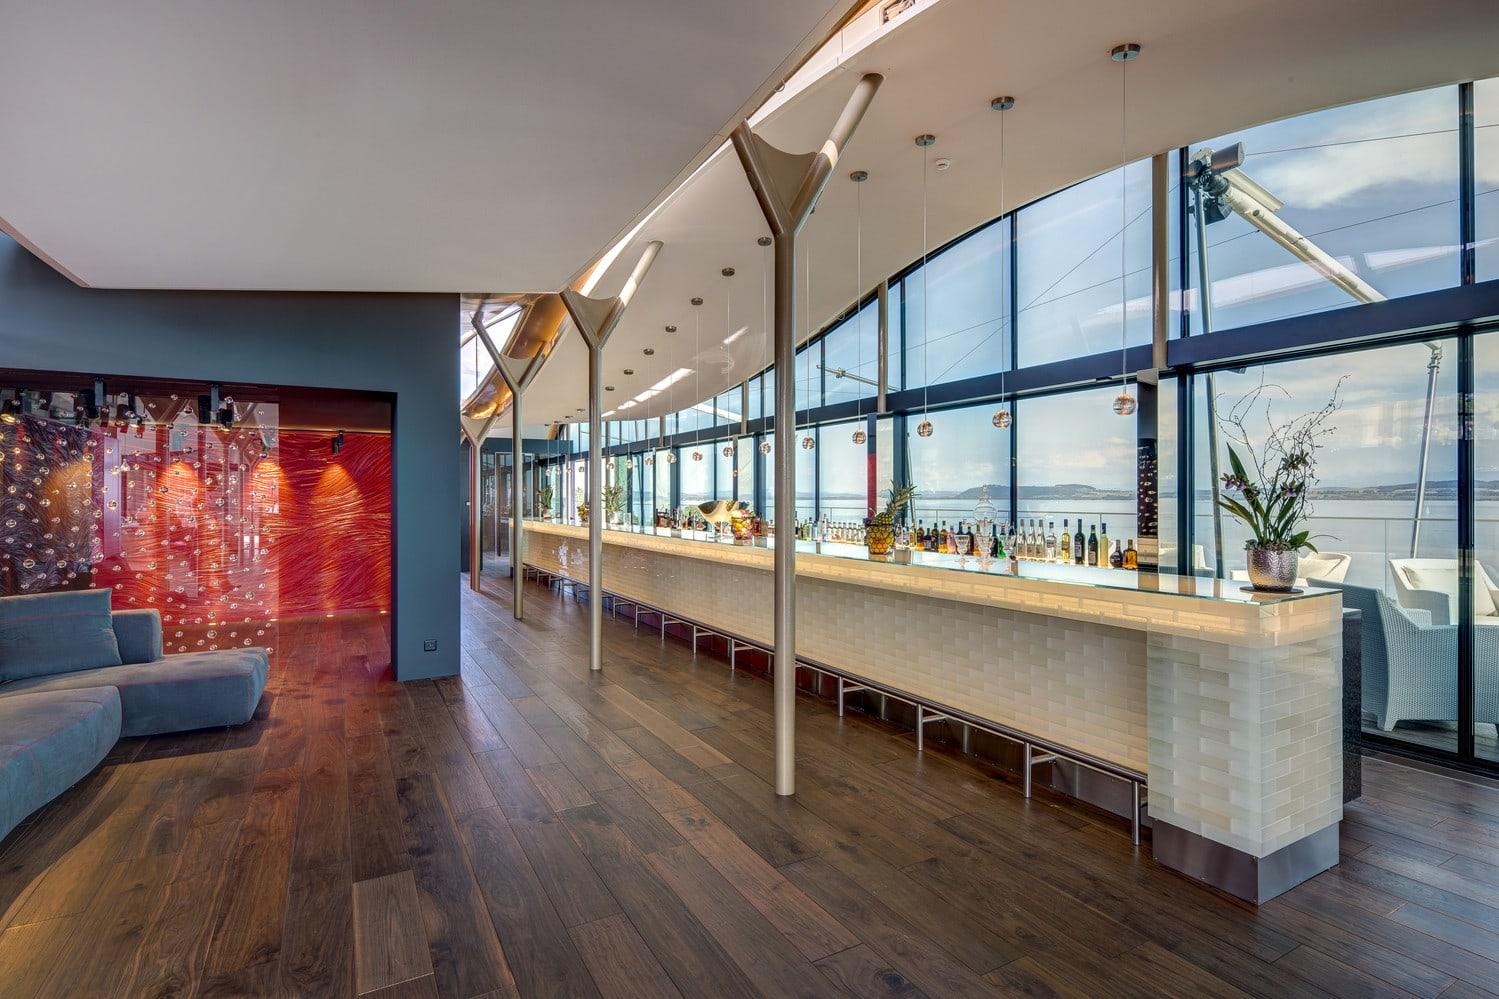 electrochromic glass used on the Best Western Premier Hotel Beaulac in Neuchâtel - Switzerland